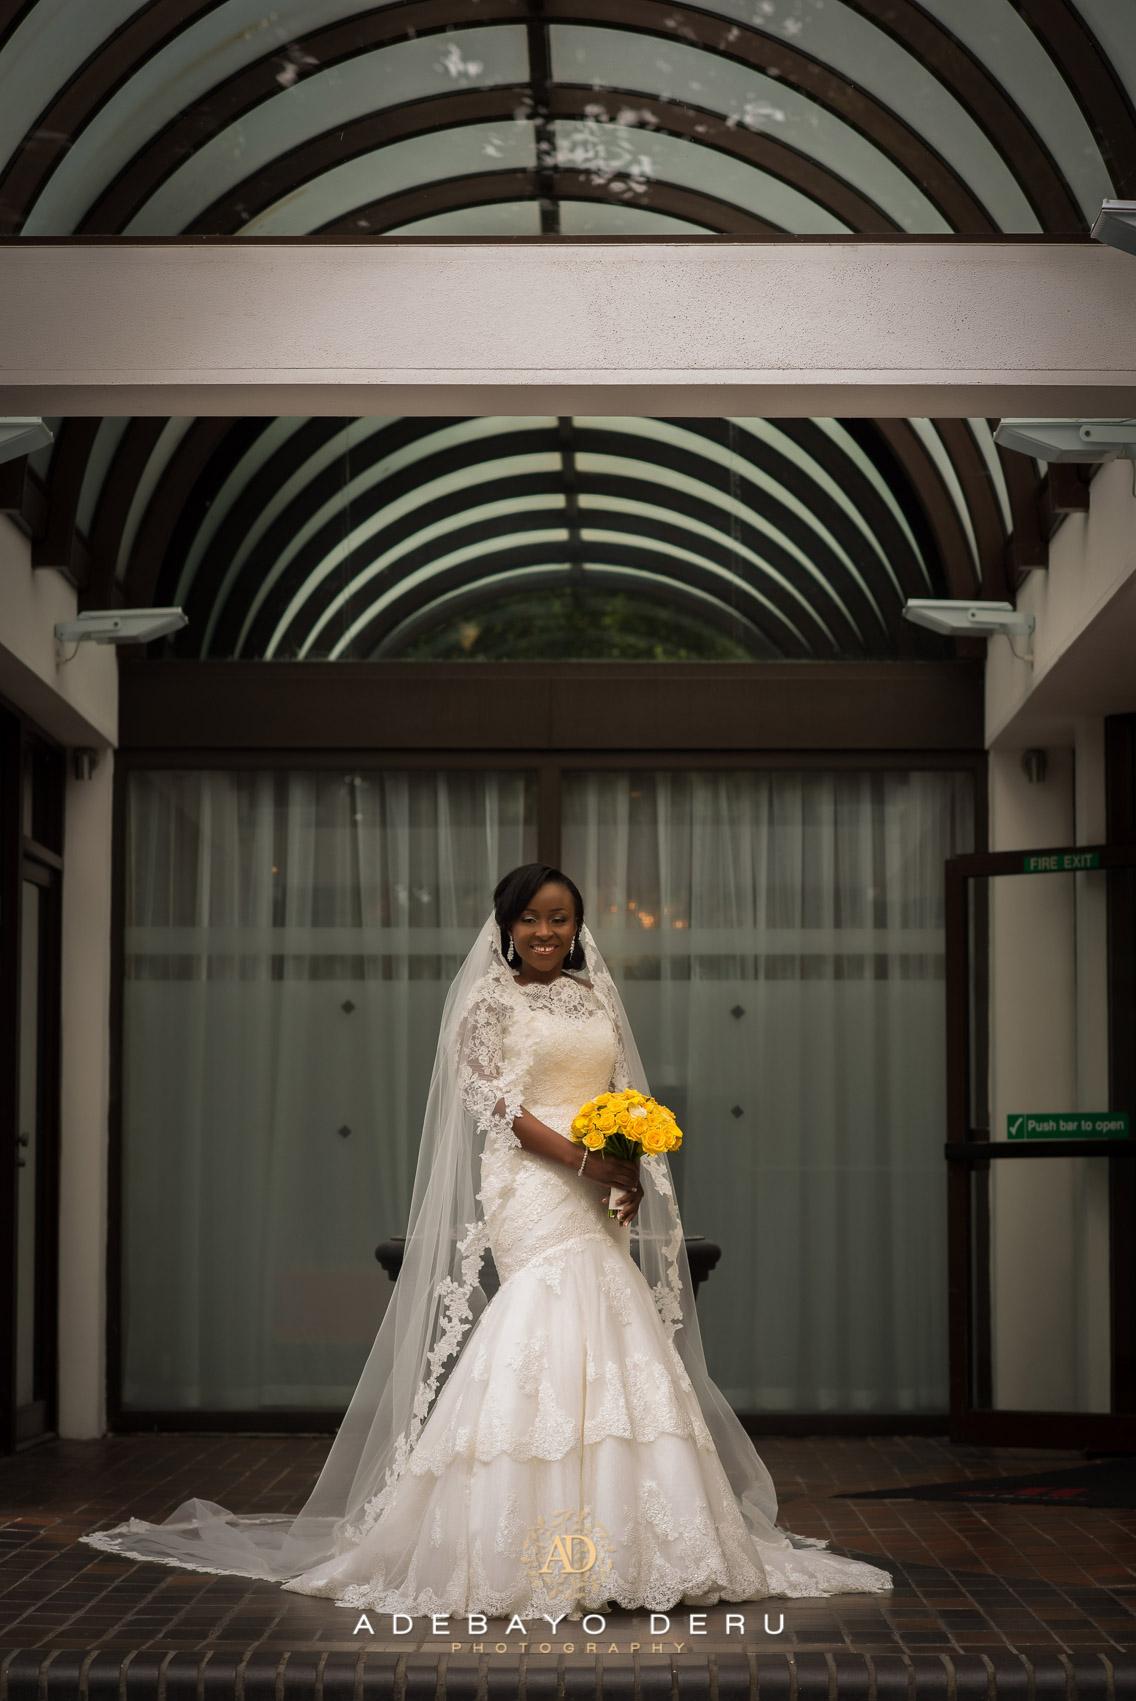 UK event and wedding planner ROE Weddings